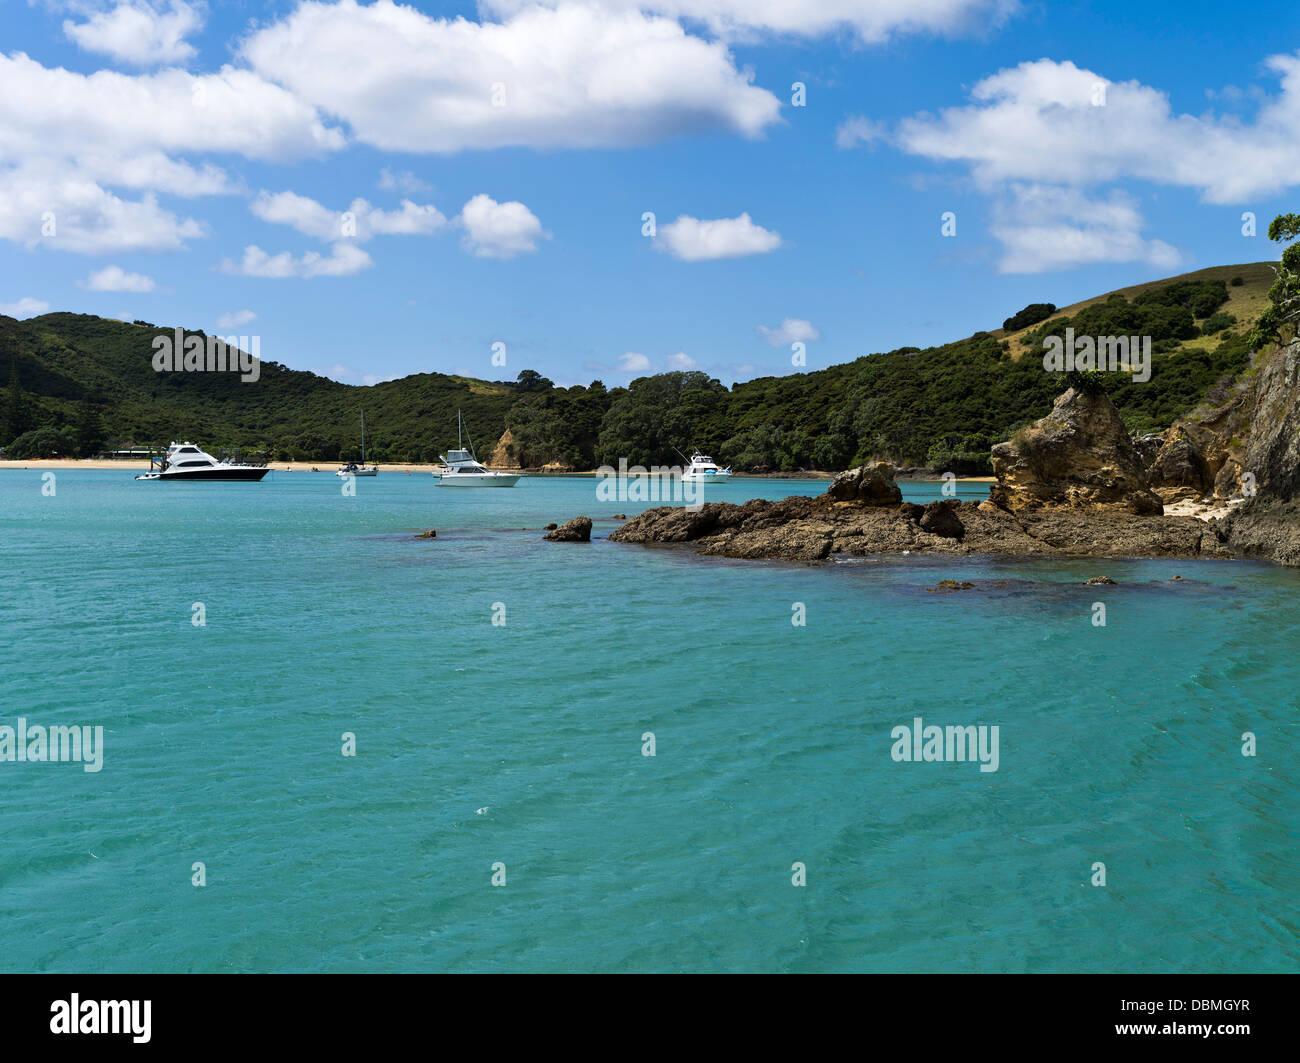 dh Urupukapuka Island BAY OF ISLANDS NEW ZEALAND Yachts at anchor Island Otaio bay Indico Bay - Stock Image